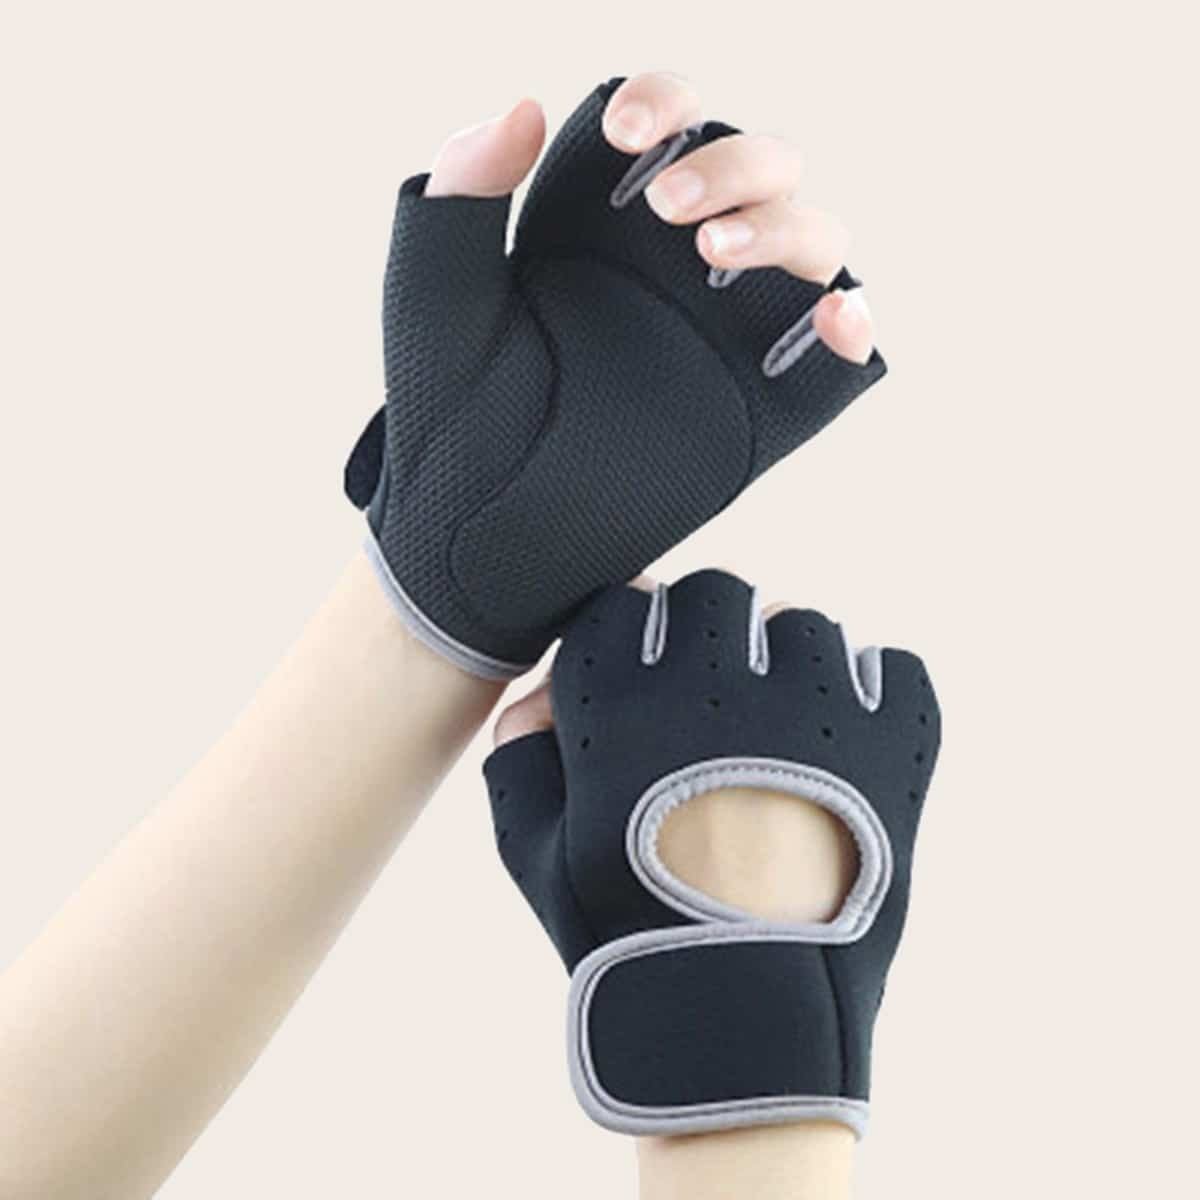 Cut Out Decor vingerloze handschoenen 1 paar